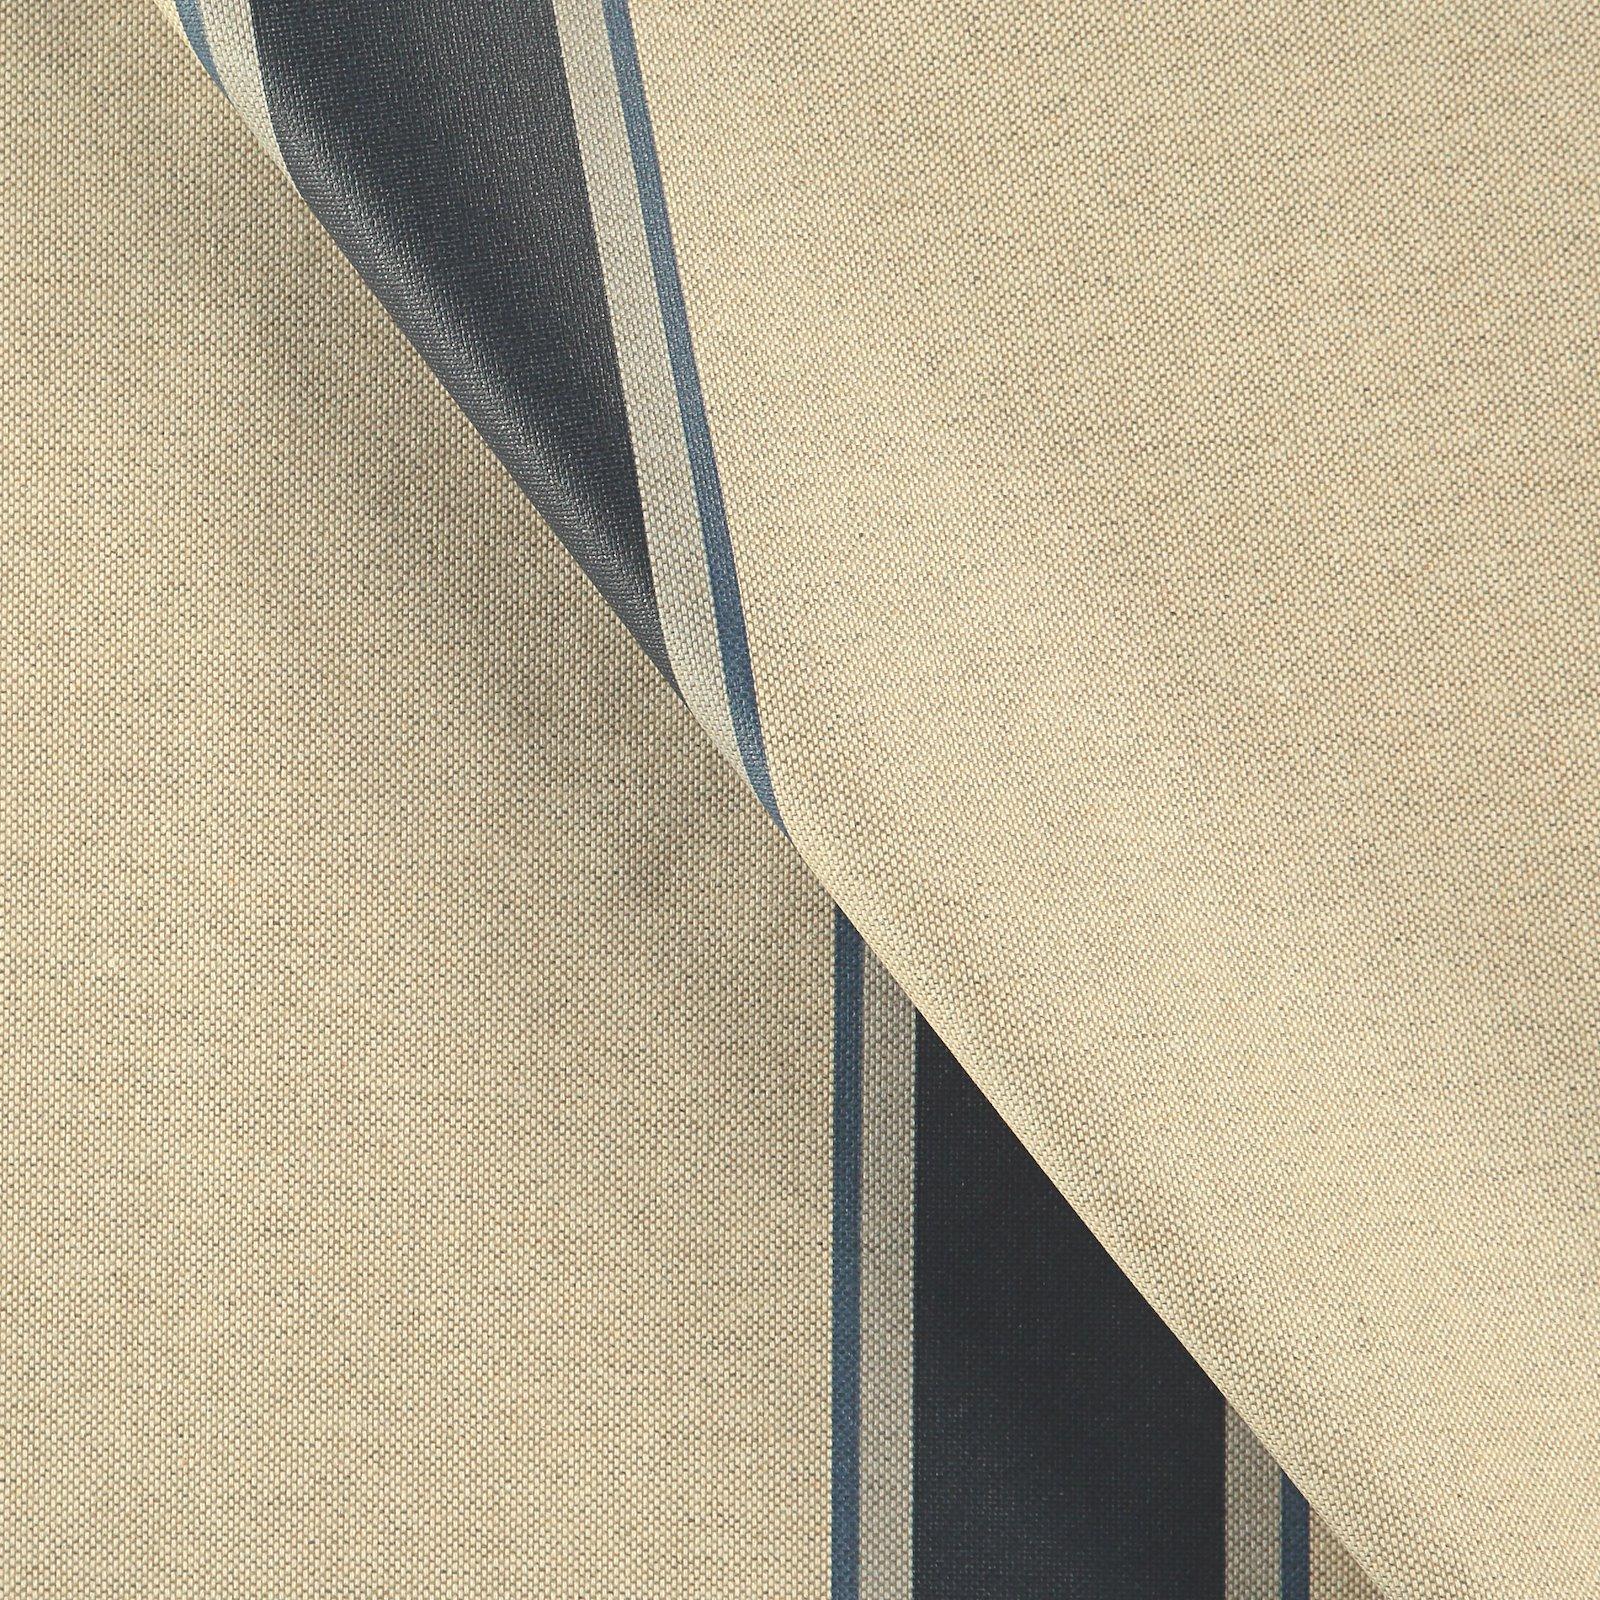 Woven oilcloth linenlook w blue stripes